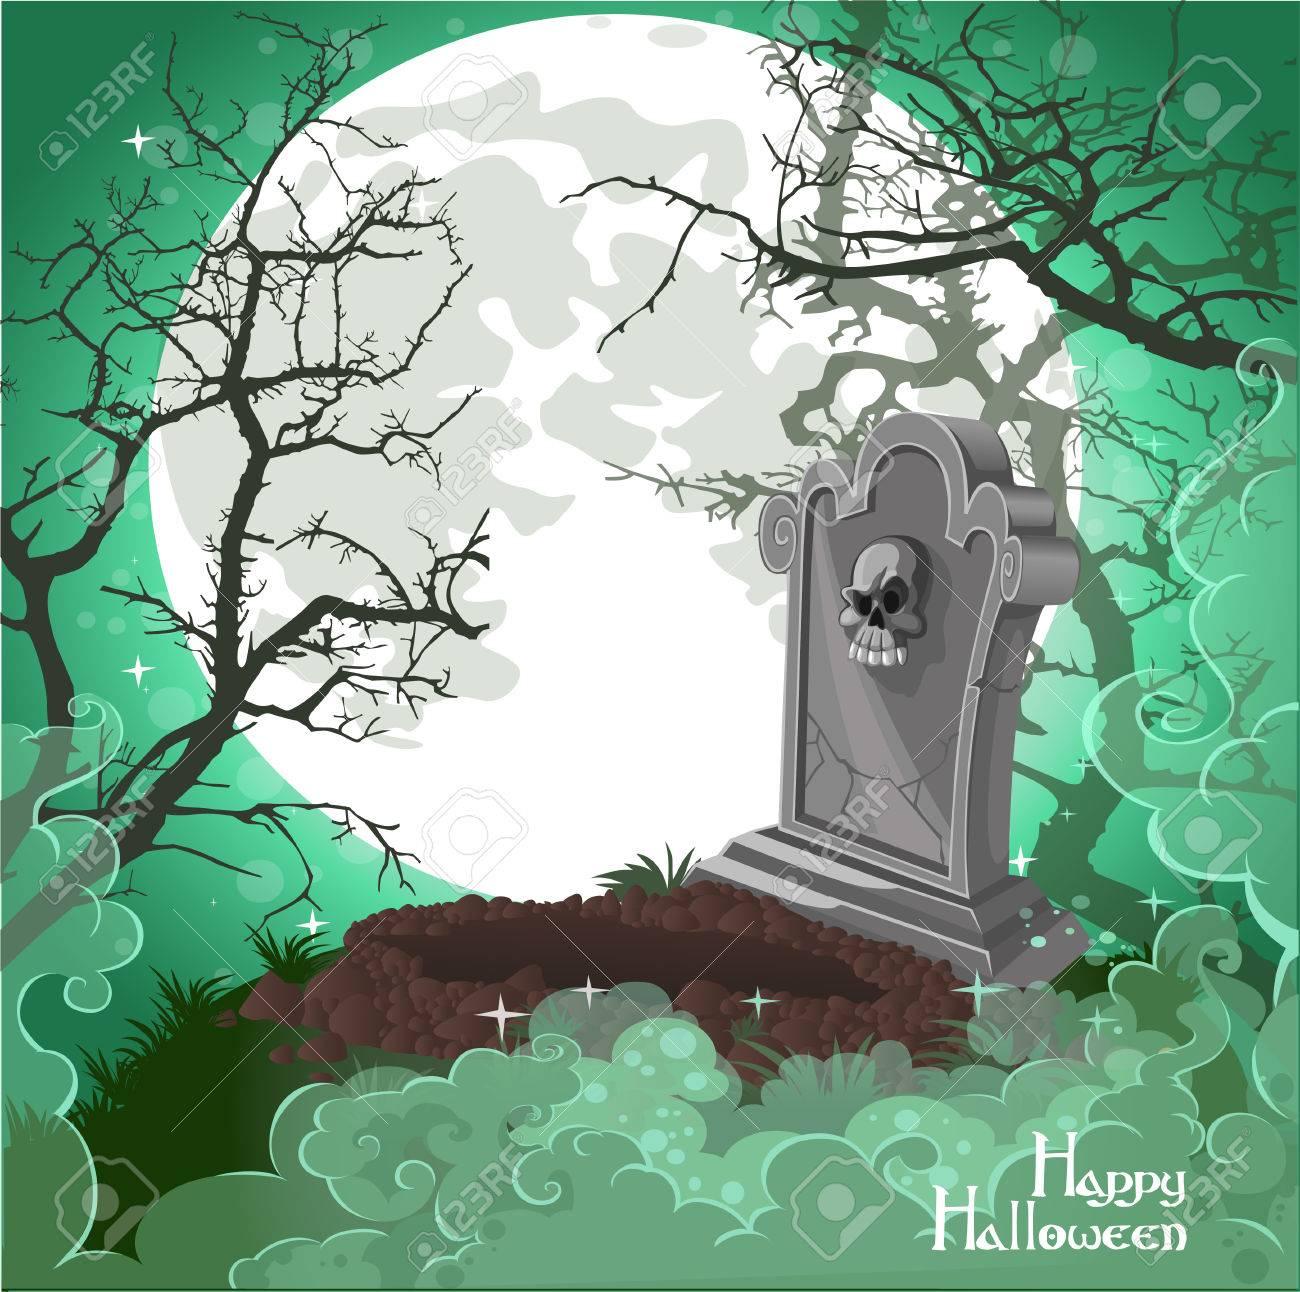 Halloween Decorations Tombstone On Halloween Card